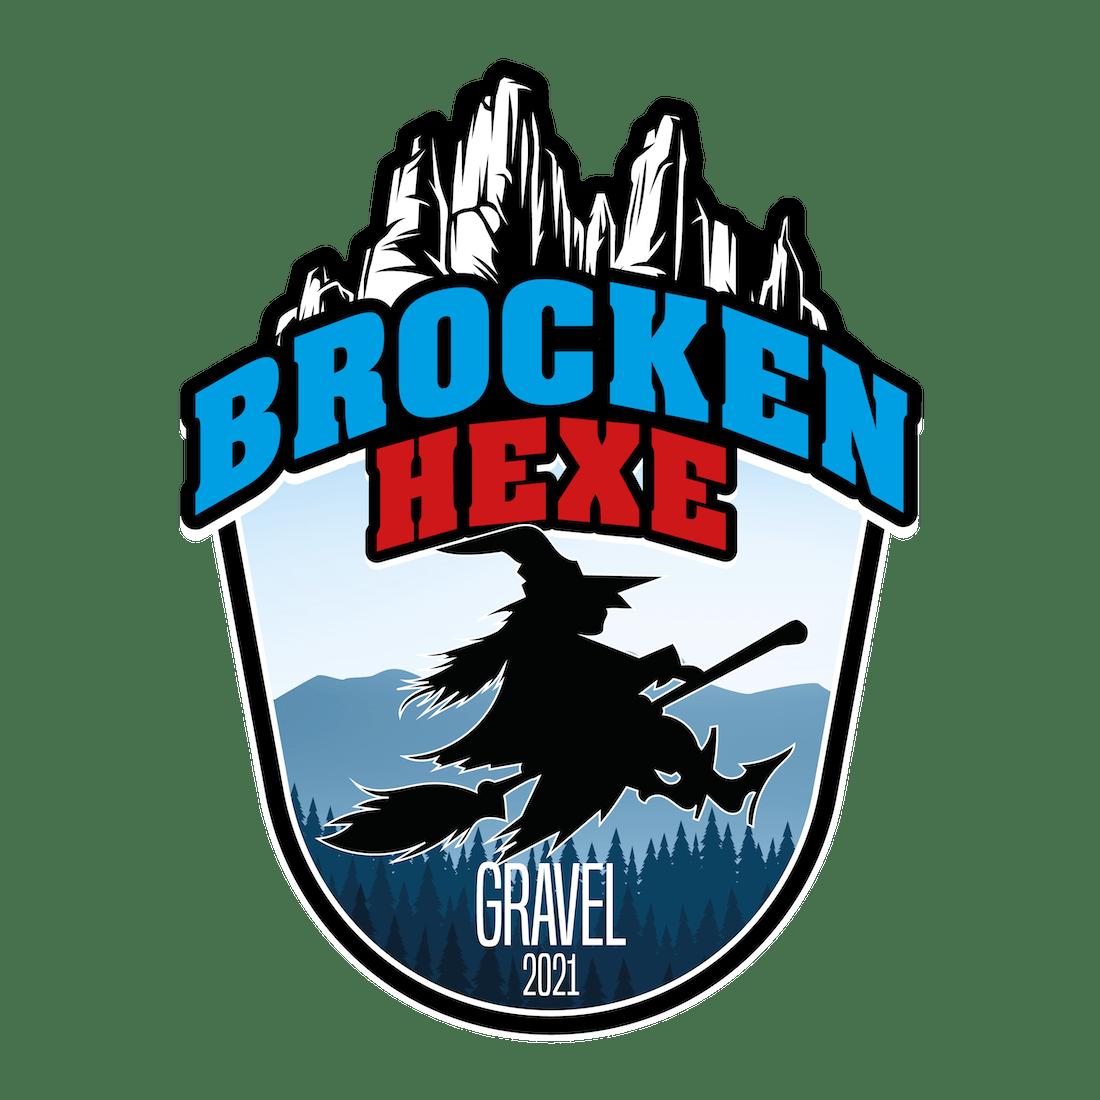 Brockenhexe Gravelride